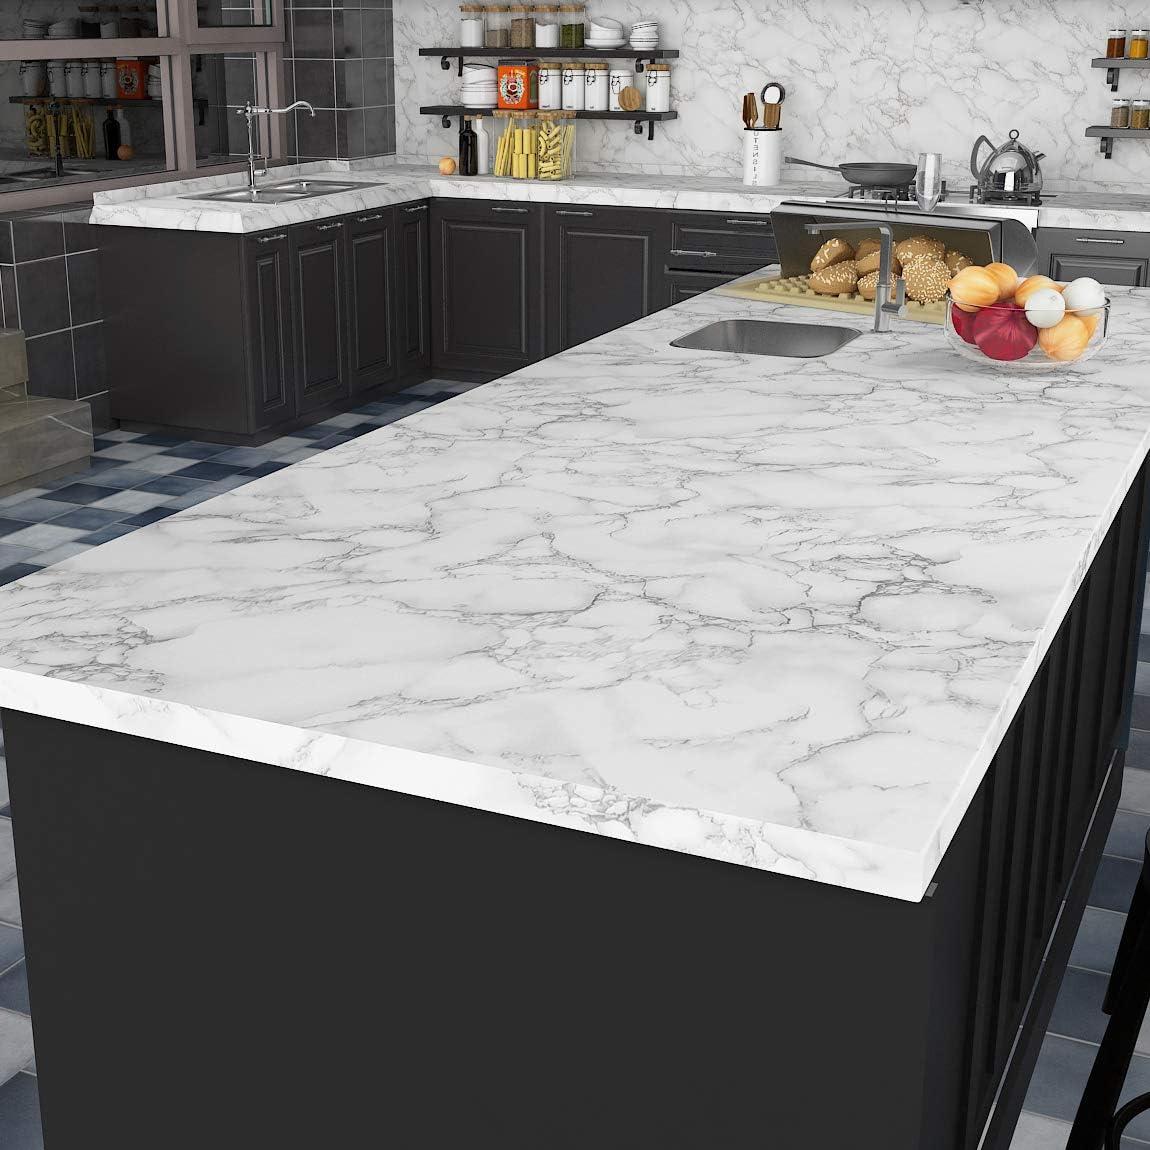 Livelynine Matte Marble Contact Paper for Desk Table Kitchen Countertop  Peel and Stick Wallpaper for Bathroom Counter Top Bedroom Floor Vinyl  Flooring ...